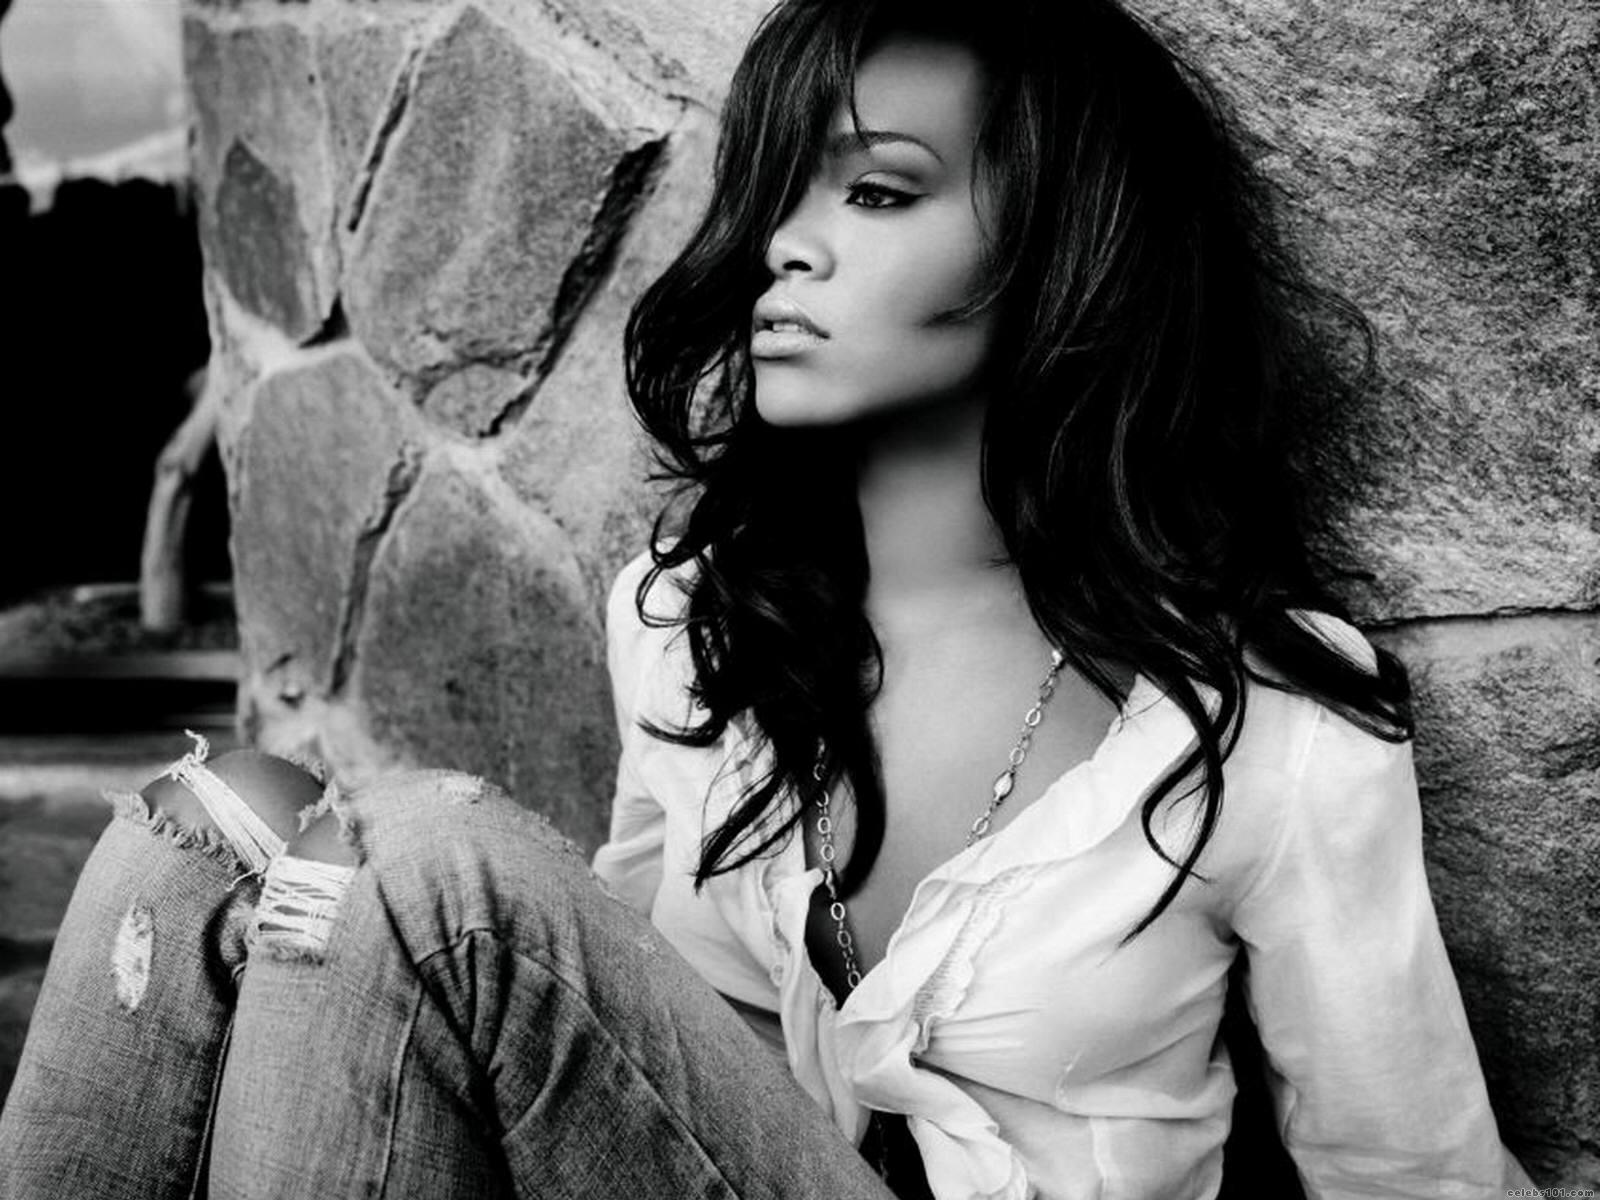 http://2.bp.blogspot.com/-Aoh1gp5czLo/Te1sP9yv7fI/AAAAAAAAAe0/NeotyBV0nUw/s1600/Rihanna.jpg